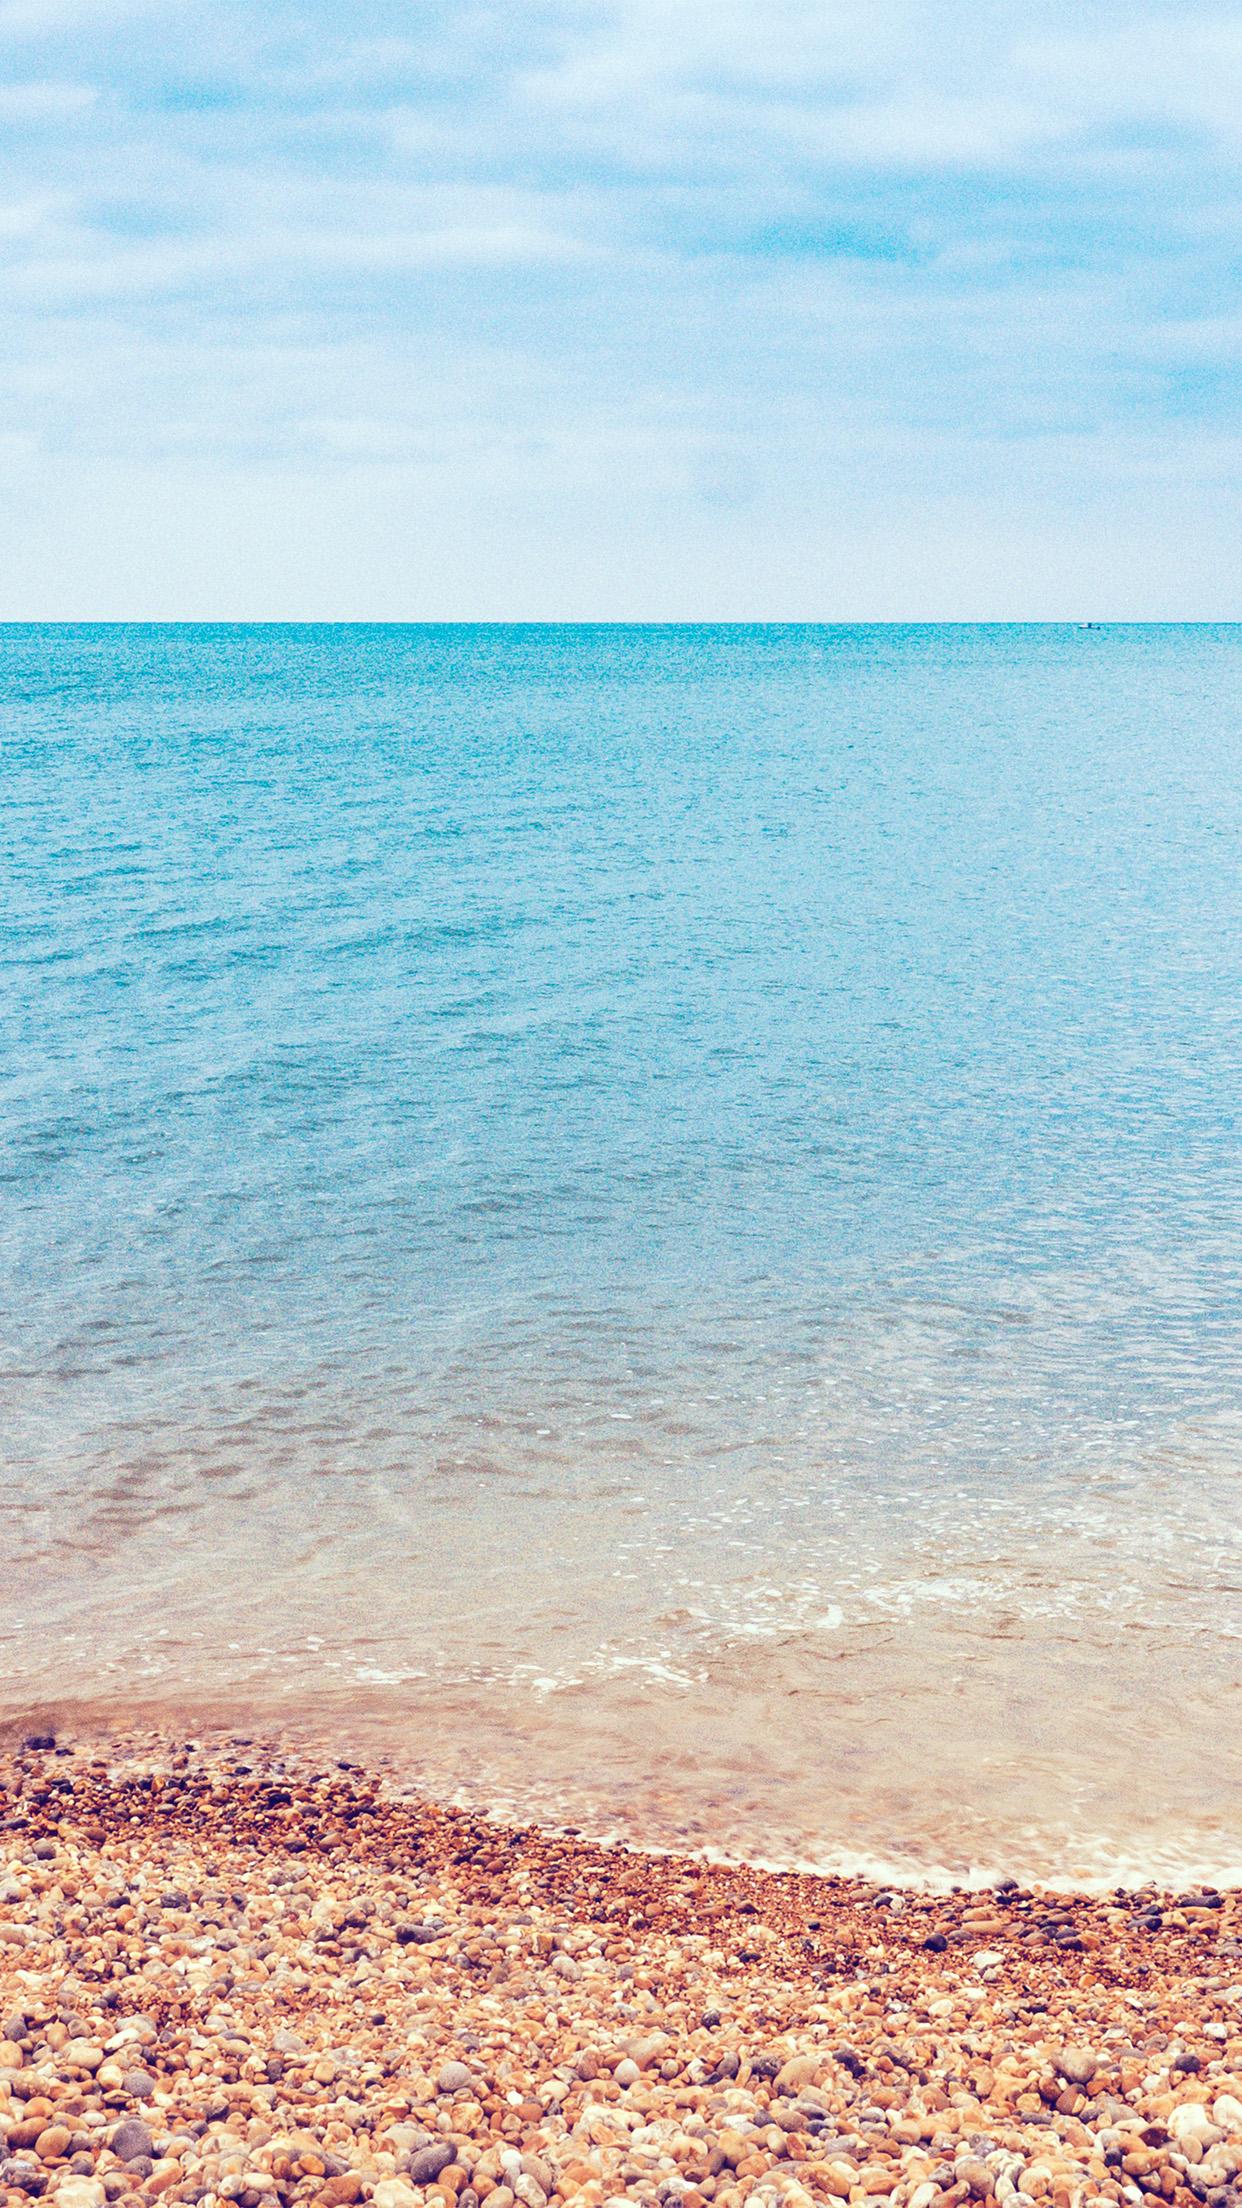 Sea Nature Beach Blue Sky Rock Happy Android Wallpaper